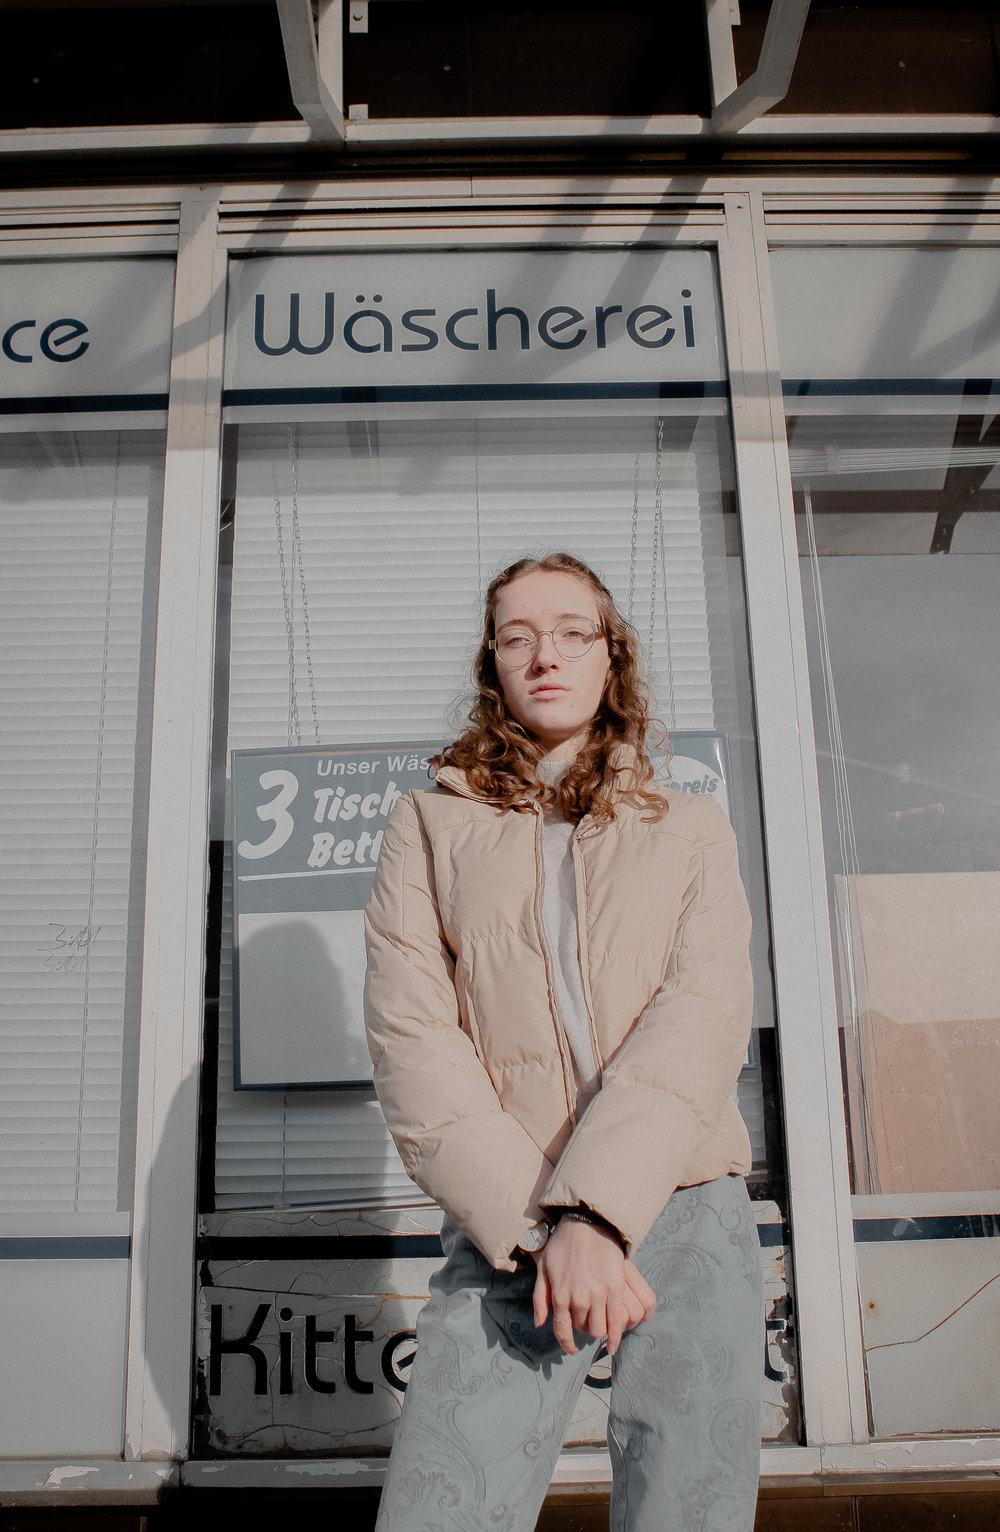 moodyphotos, urban photography, lifestyle photography, osnabrück, osnabrücker fotograf, niedersachsen, deutschland, herprettybravesoul, urban